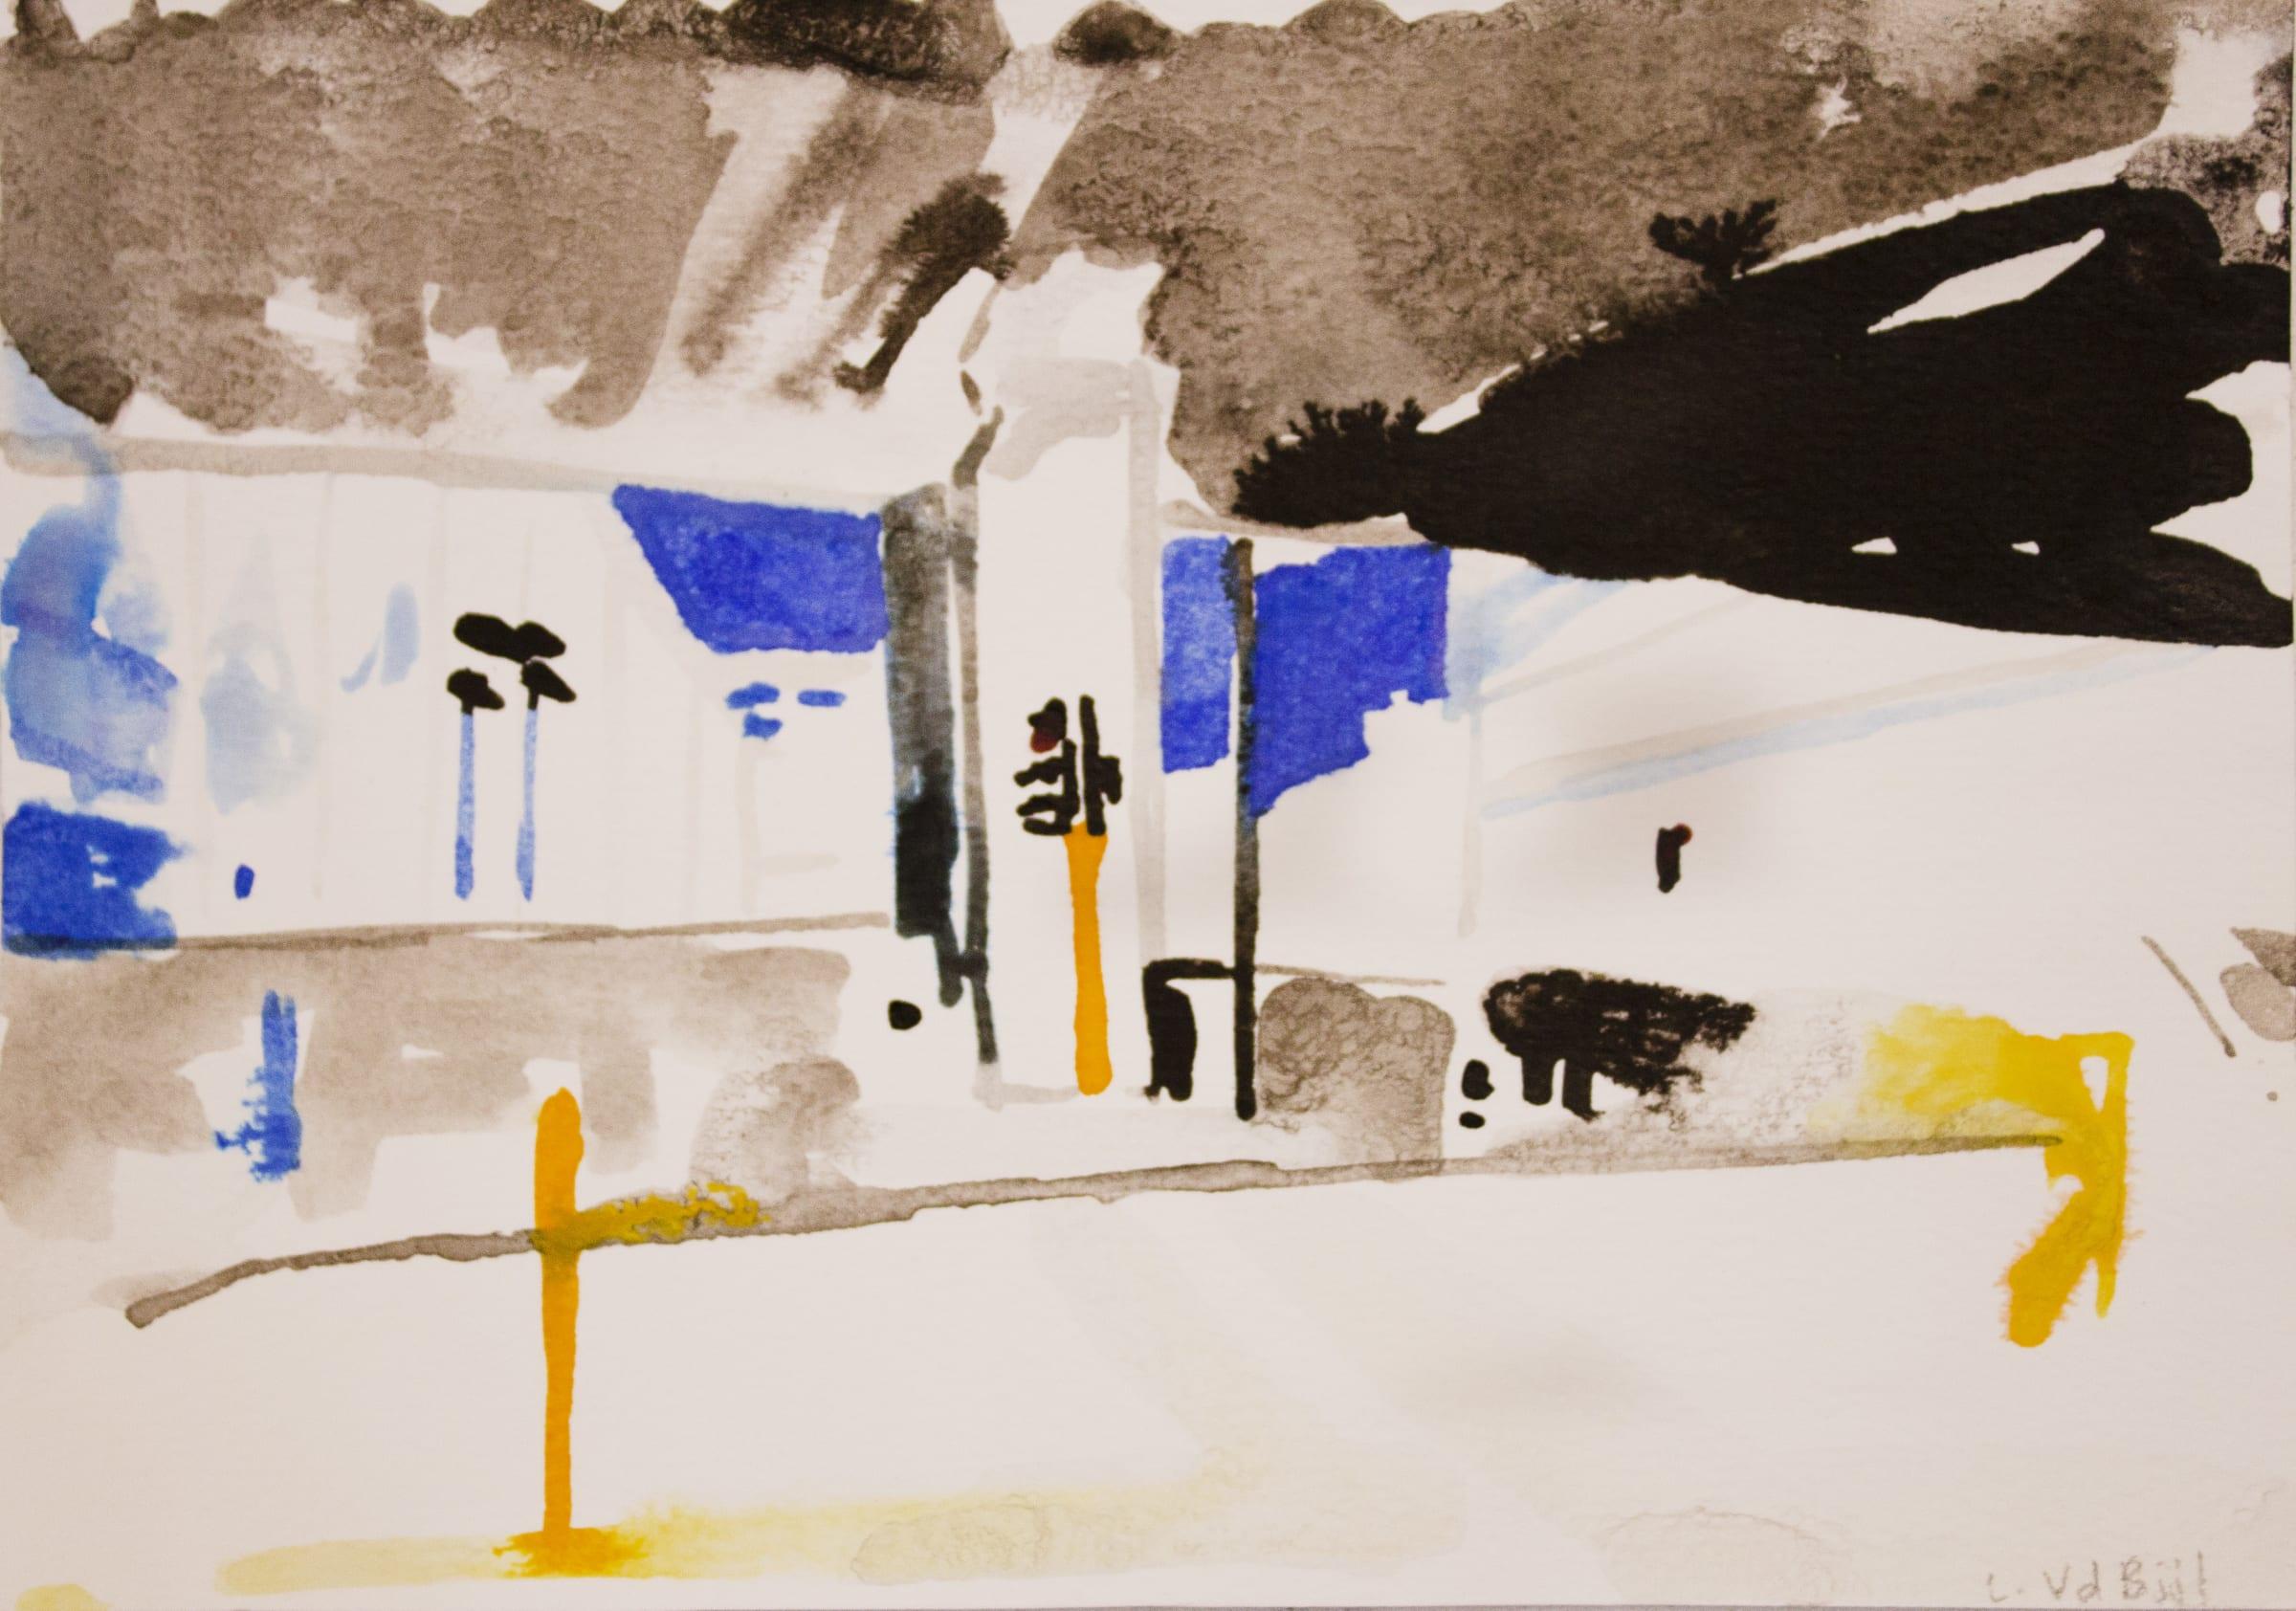 <span class=&#34;link fancybox-details-link&#34;><a href=&#34;/artists/88-louise-van-der-bijl/works/2285-louise-van-der-bijl-inktober-day-22-2018/&#34;>View Detail Page</a></span><div class=&#34;artist&#34;><strong>Louise Van Der Bijl</strong></div> <div class=&#34;title&#34;><em>Inktober Day 22</em>, 2018</div> <div class=&#34;medium&#34;>Ink On Paper</div> <div class=&#34;dimensions&#34;>15cm x 21cm</div><div class=&#34;price&#34;>R400.00</div>